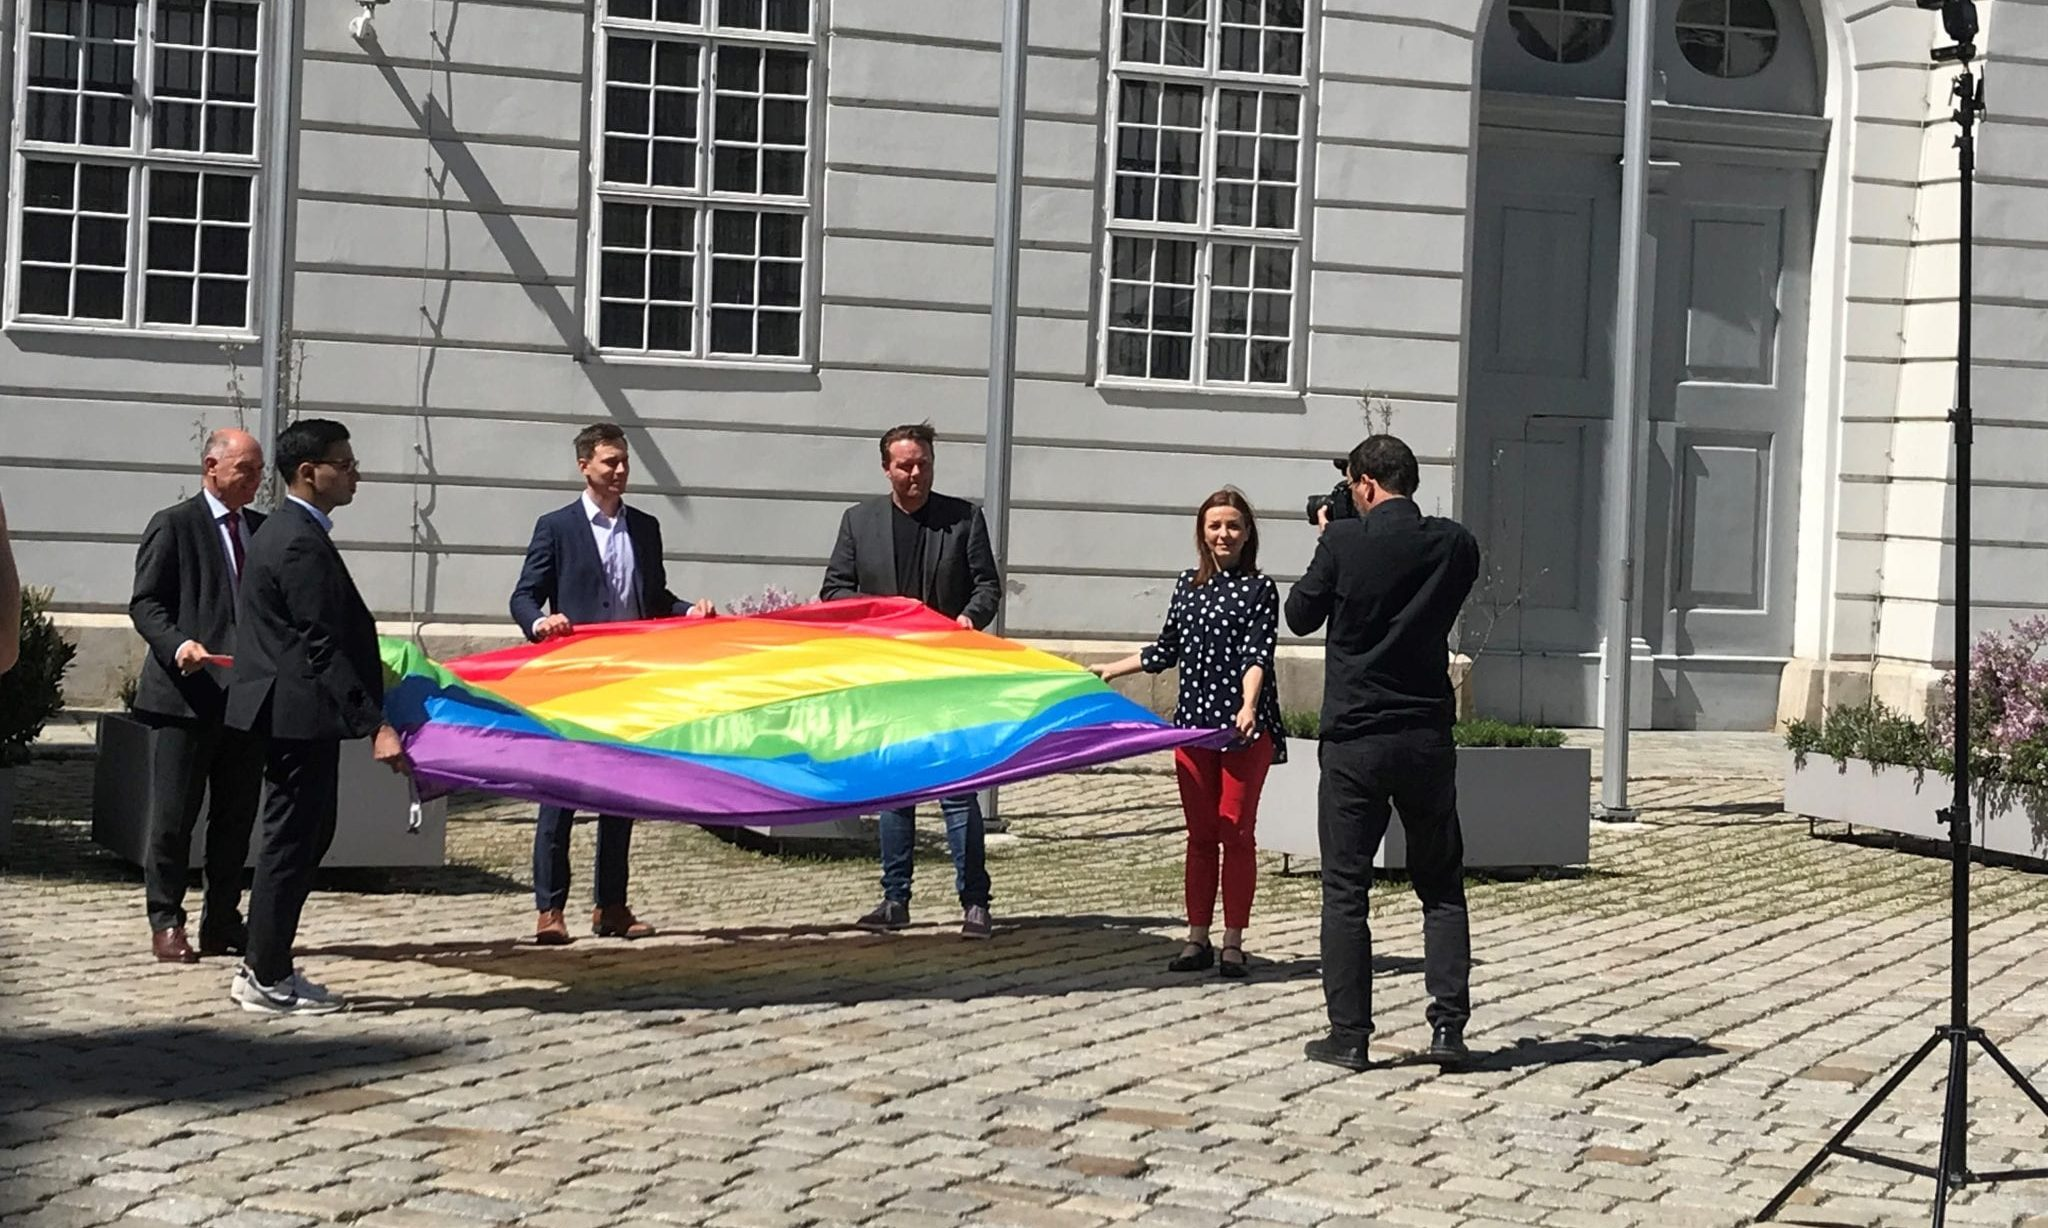 Regenbogenfahne / Parlament